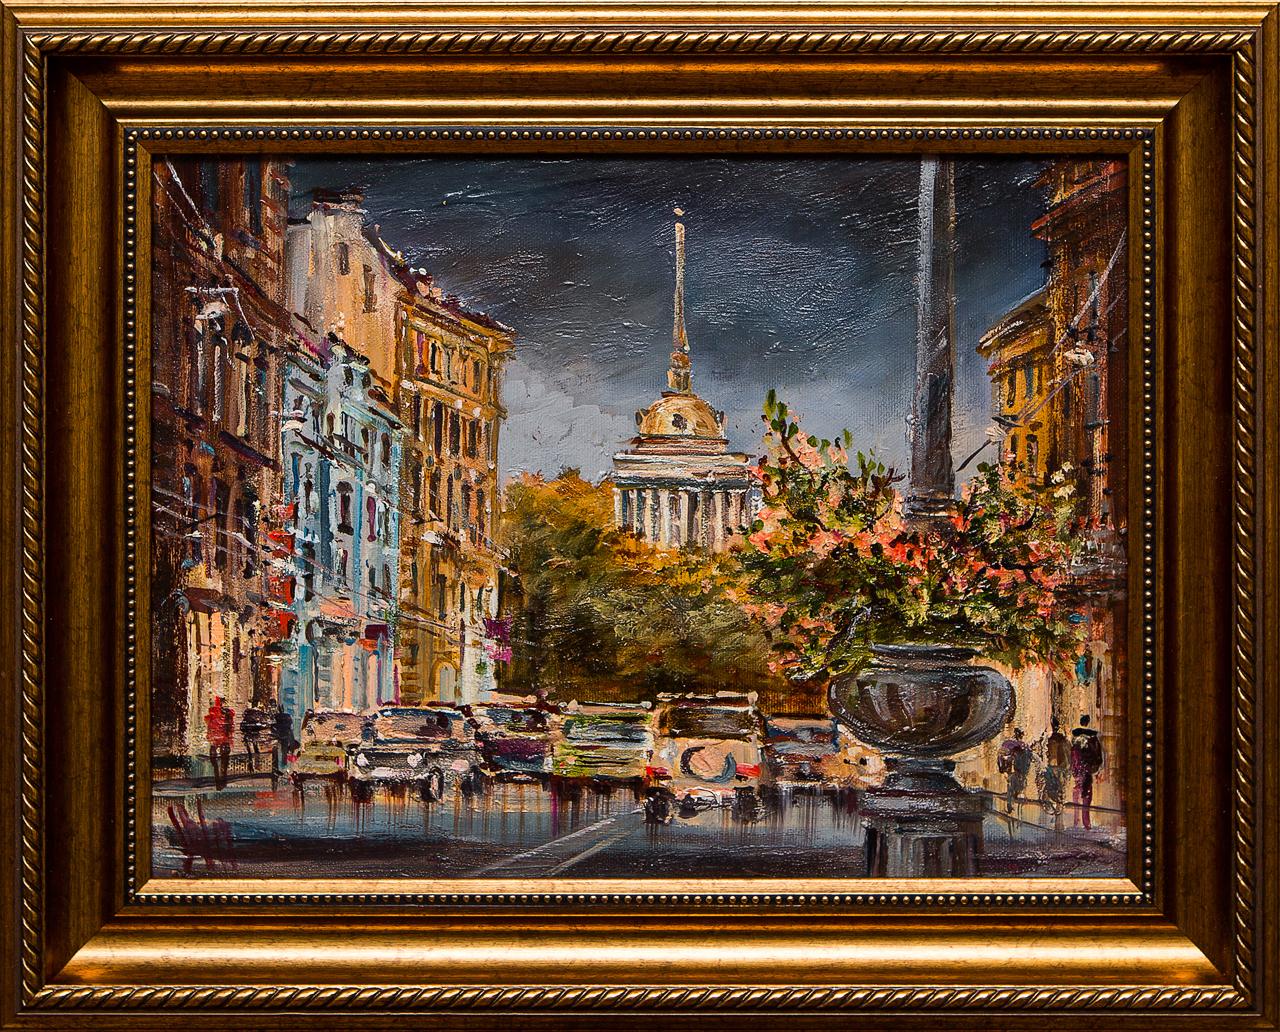 Картина маслом Шумный город Шеренкова картина маслом европа шеренкова